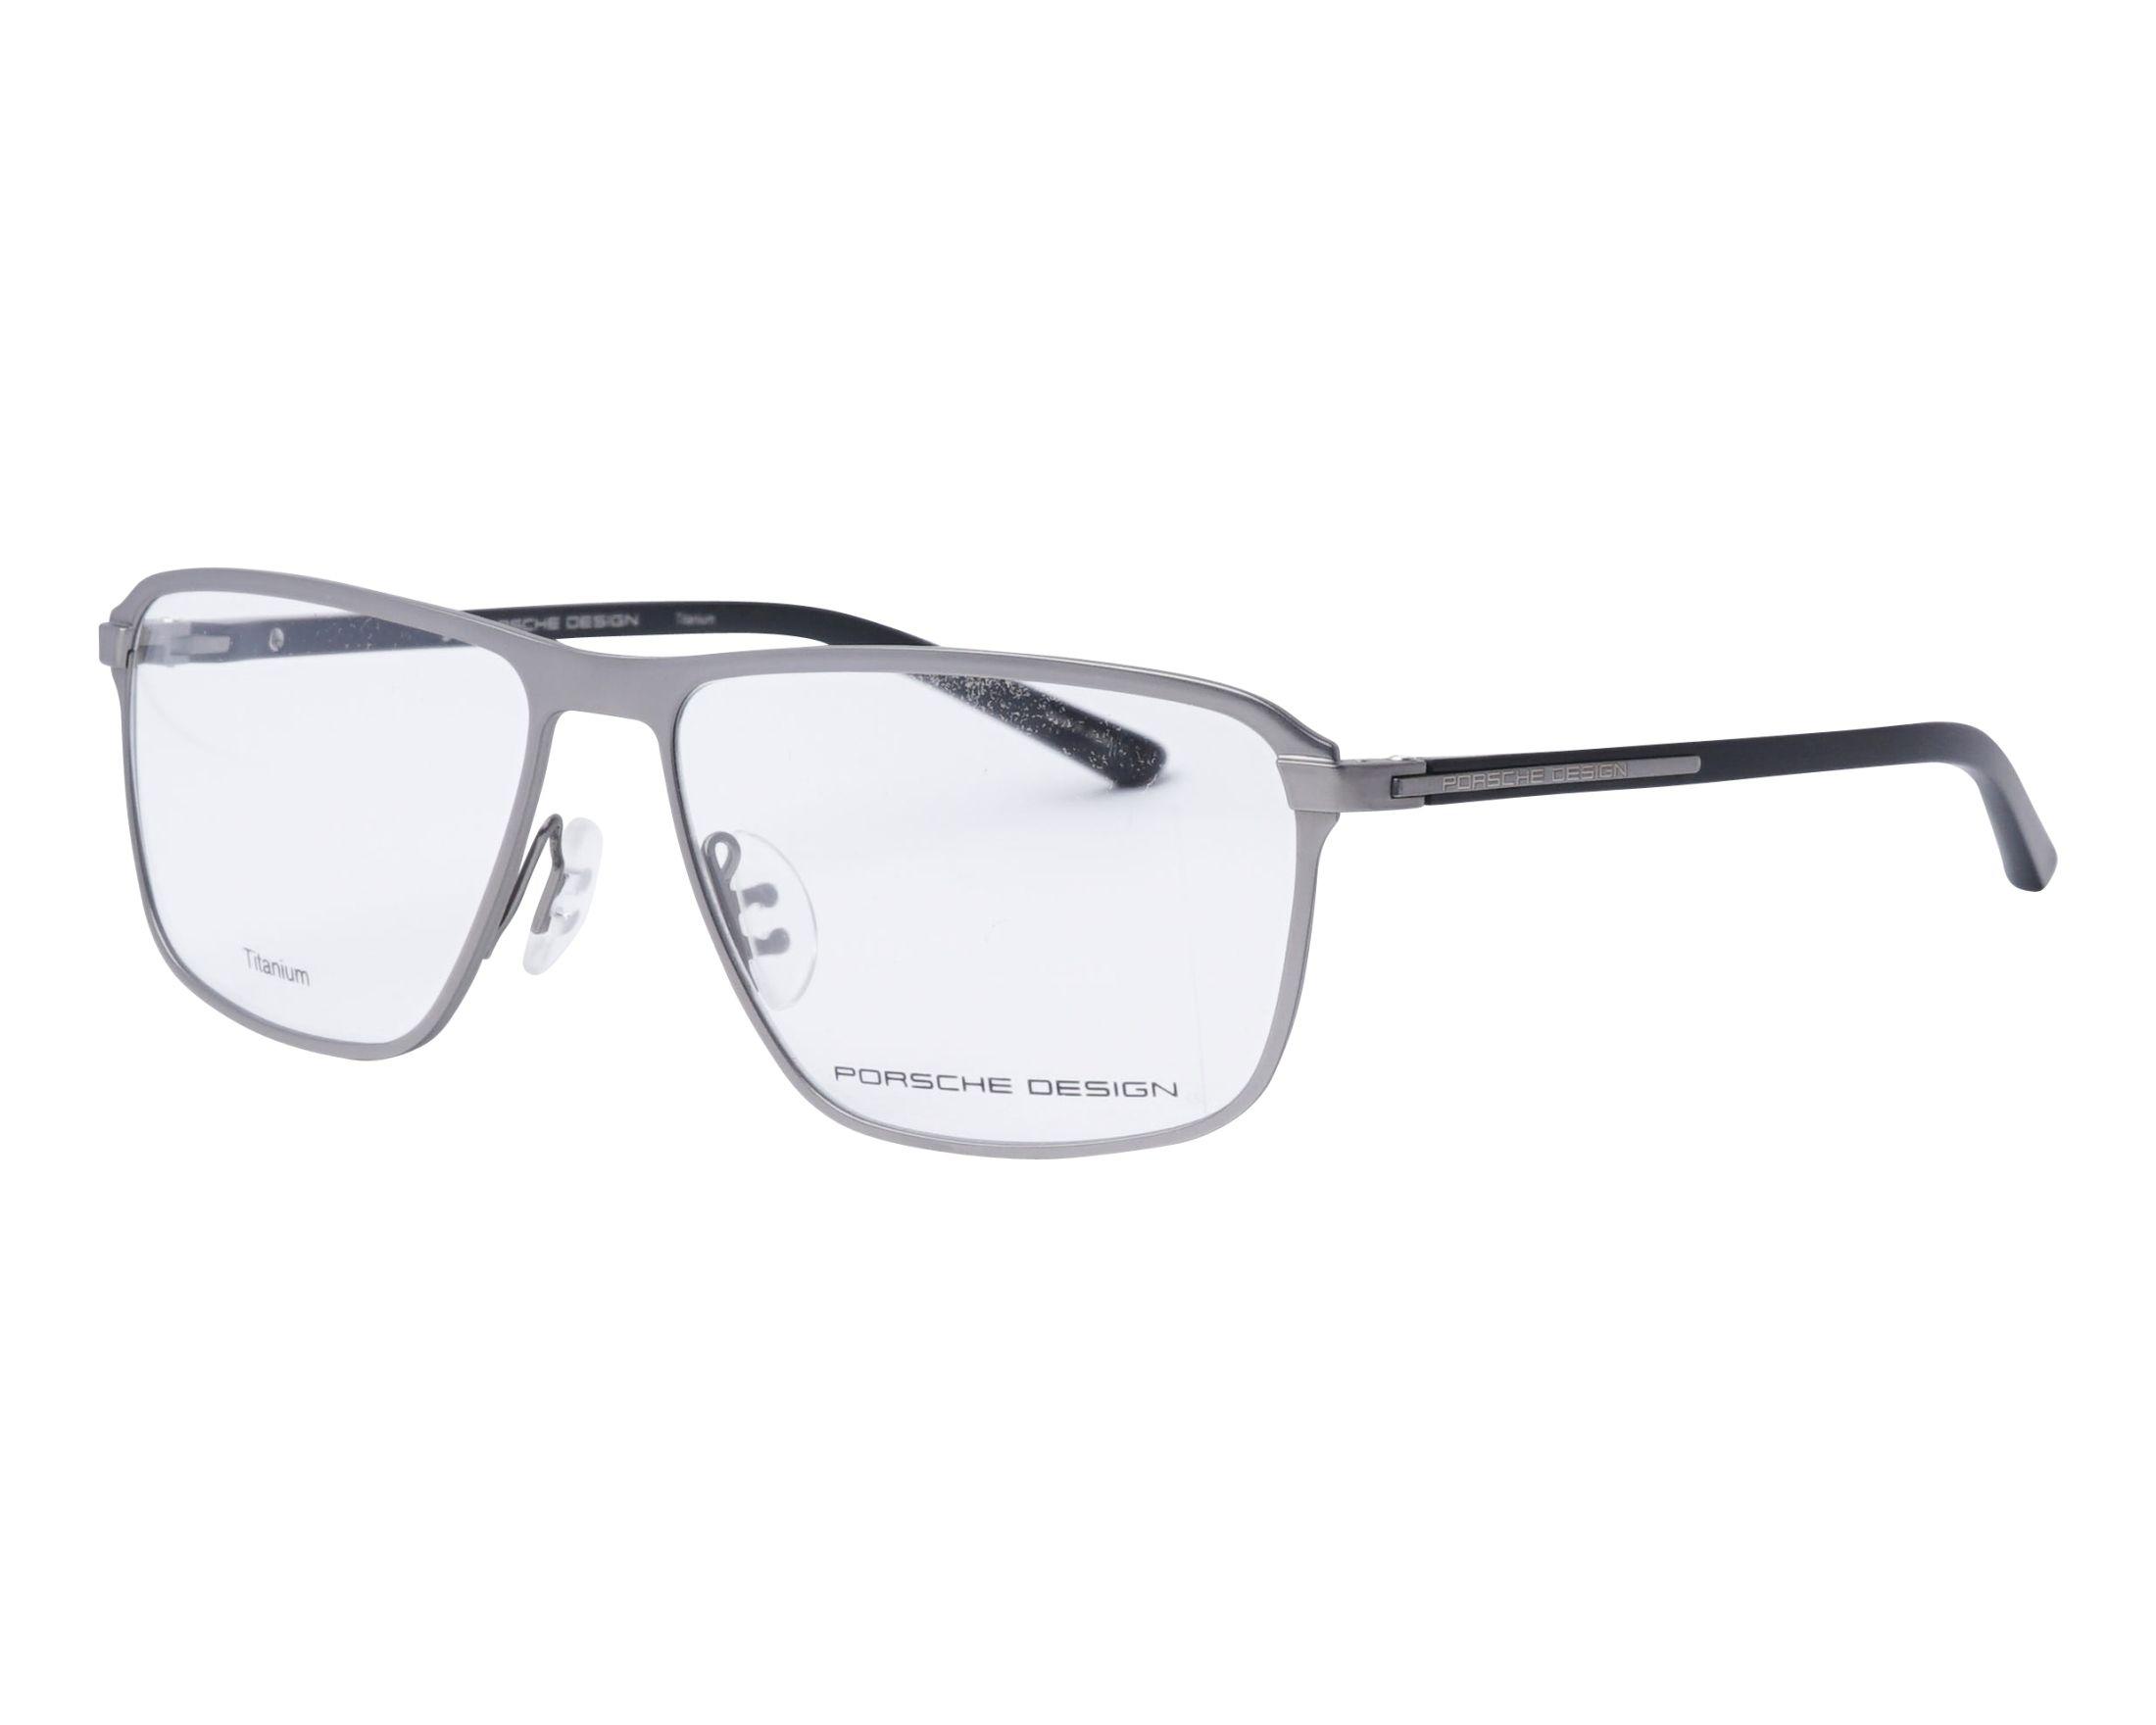 2a3578f226 Gafas Graduadas Porsche Design P-8285 C 54-14 Plata Negra vista de perfil